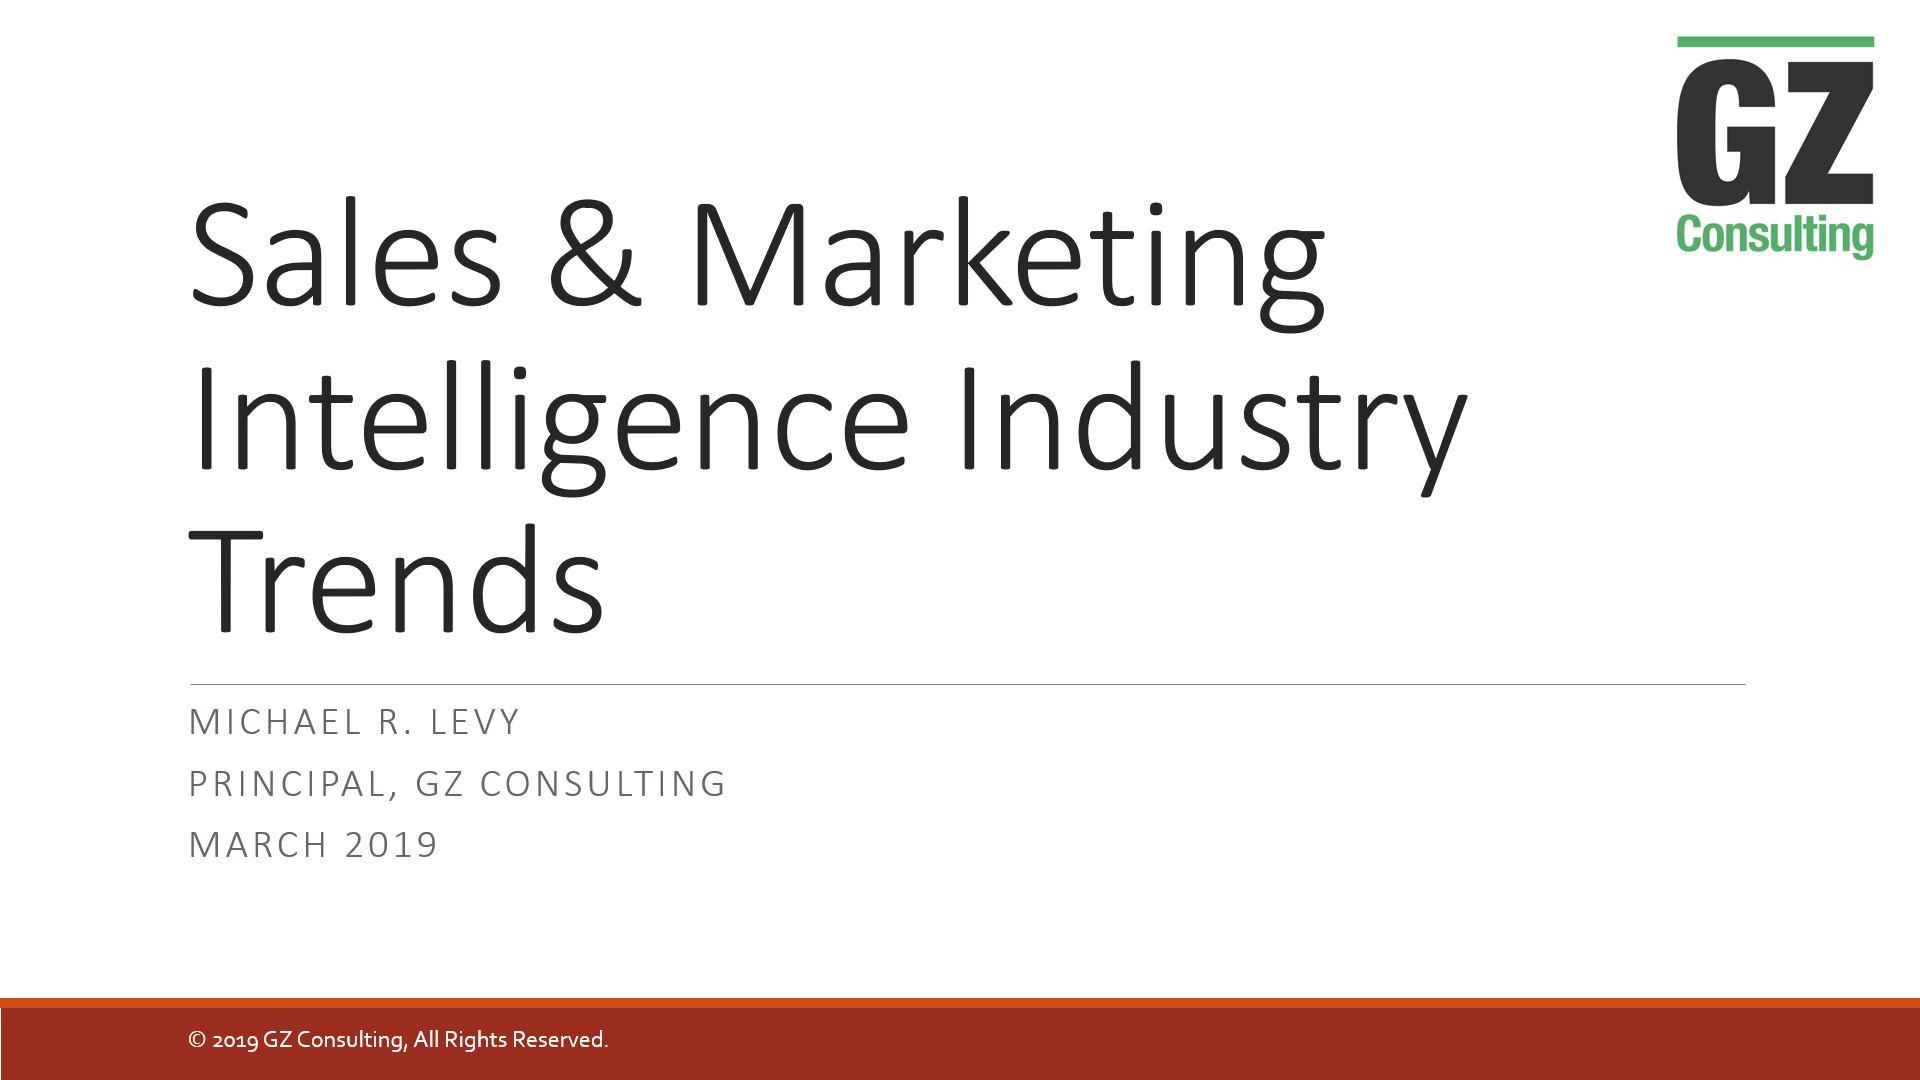 Sales & Marketing Intelligence Trends